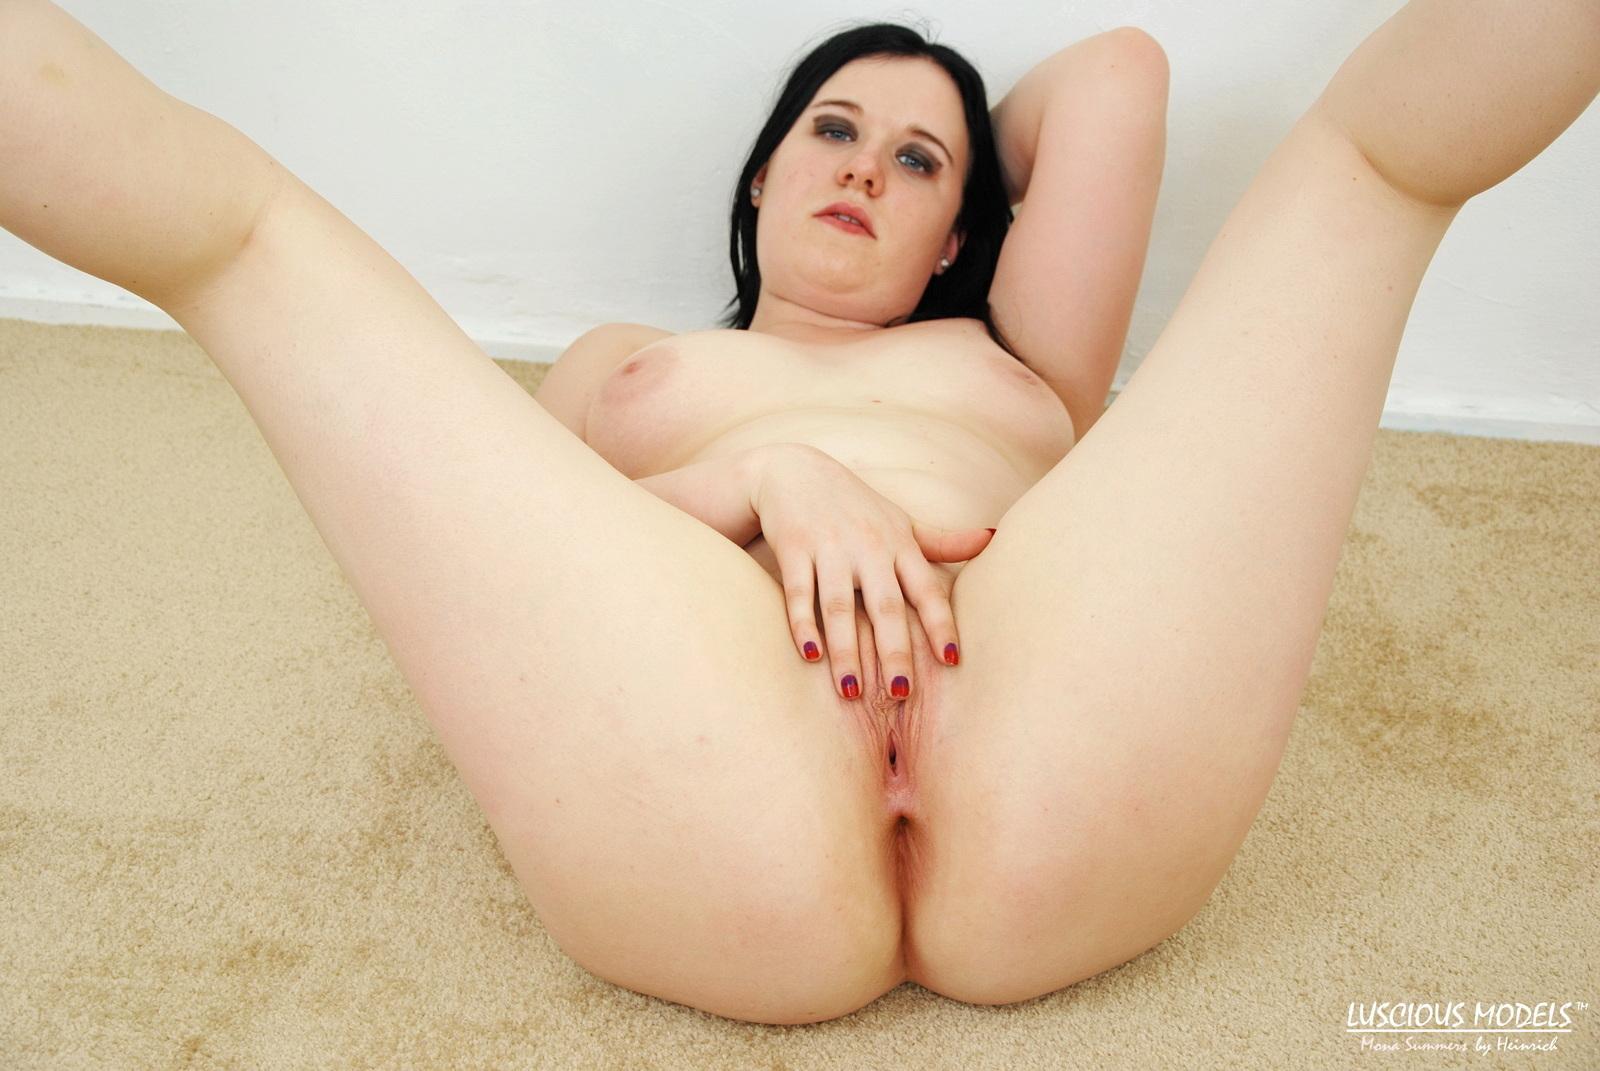 LusciousModels - Mona young Dutch pornslut 12